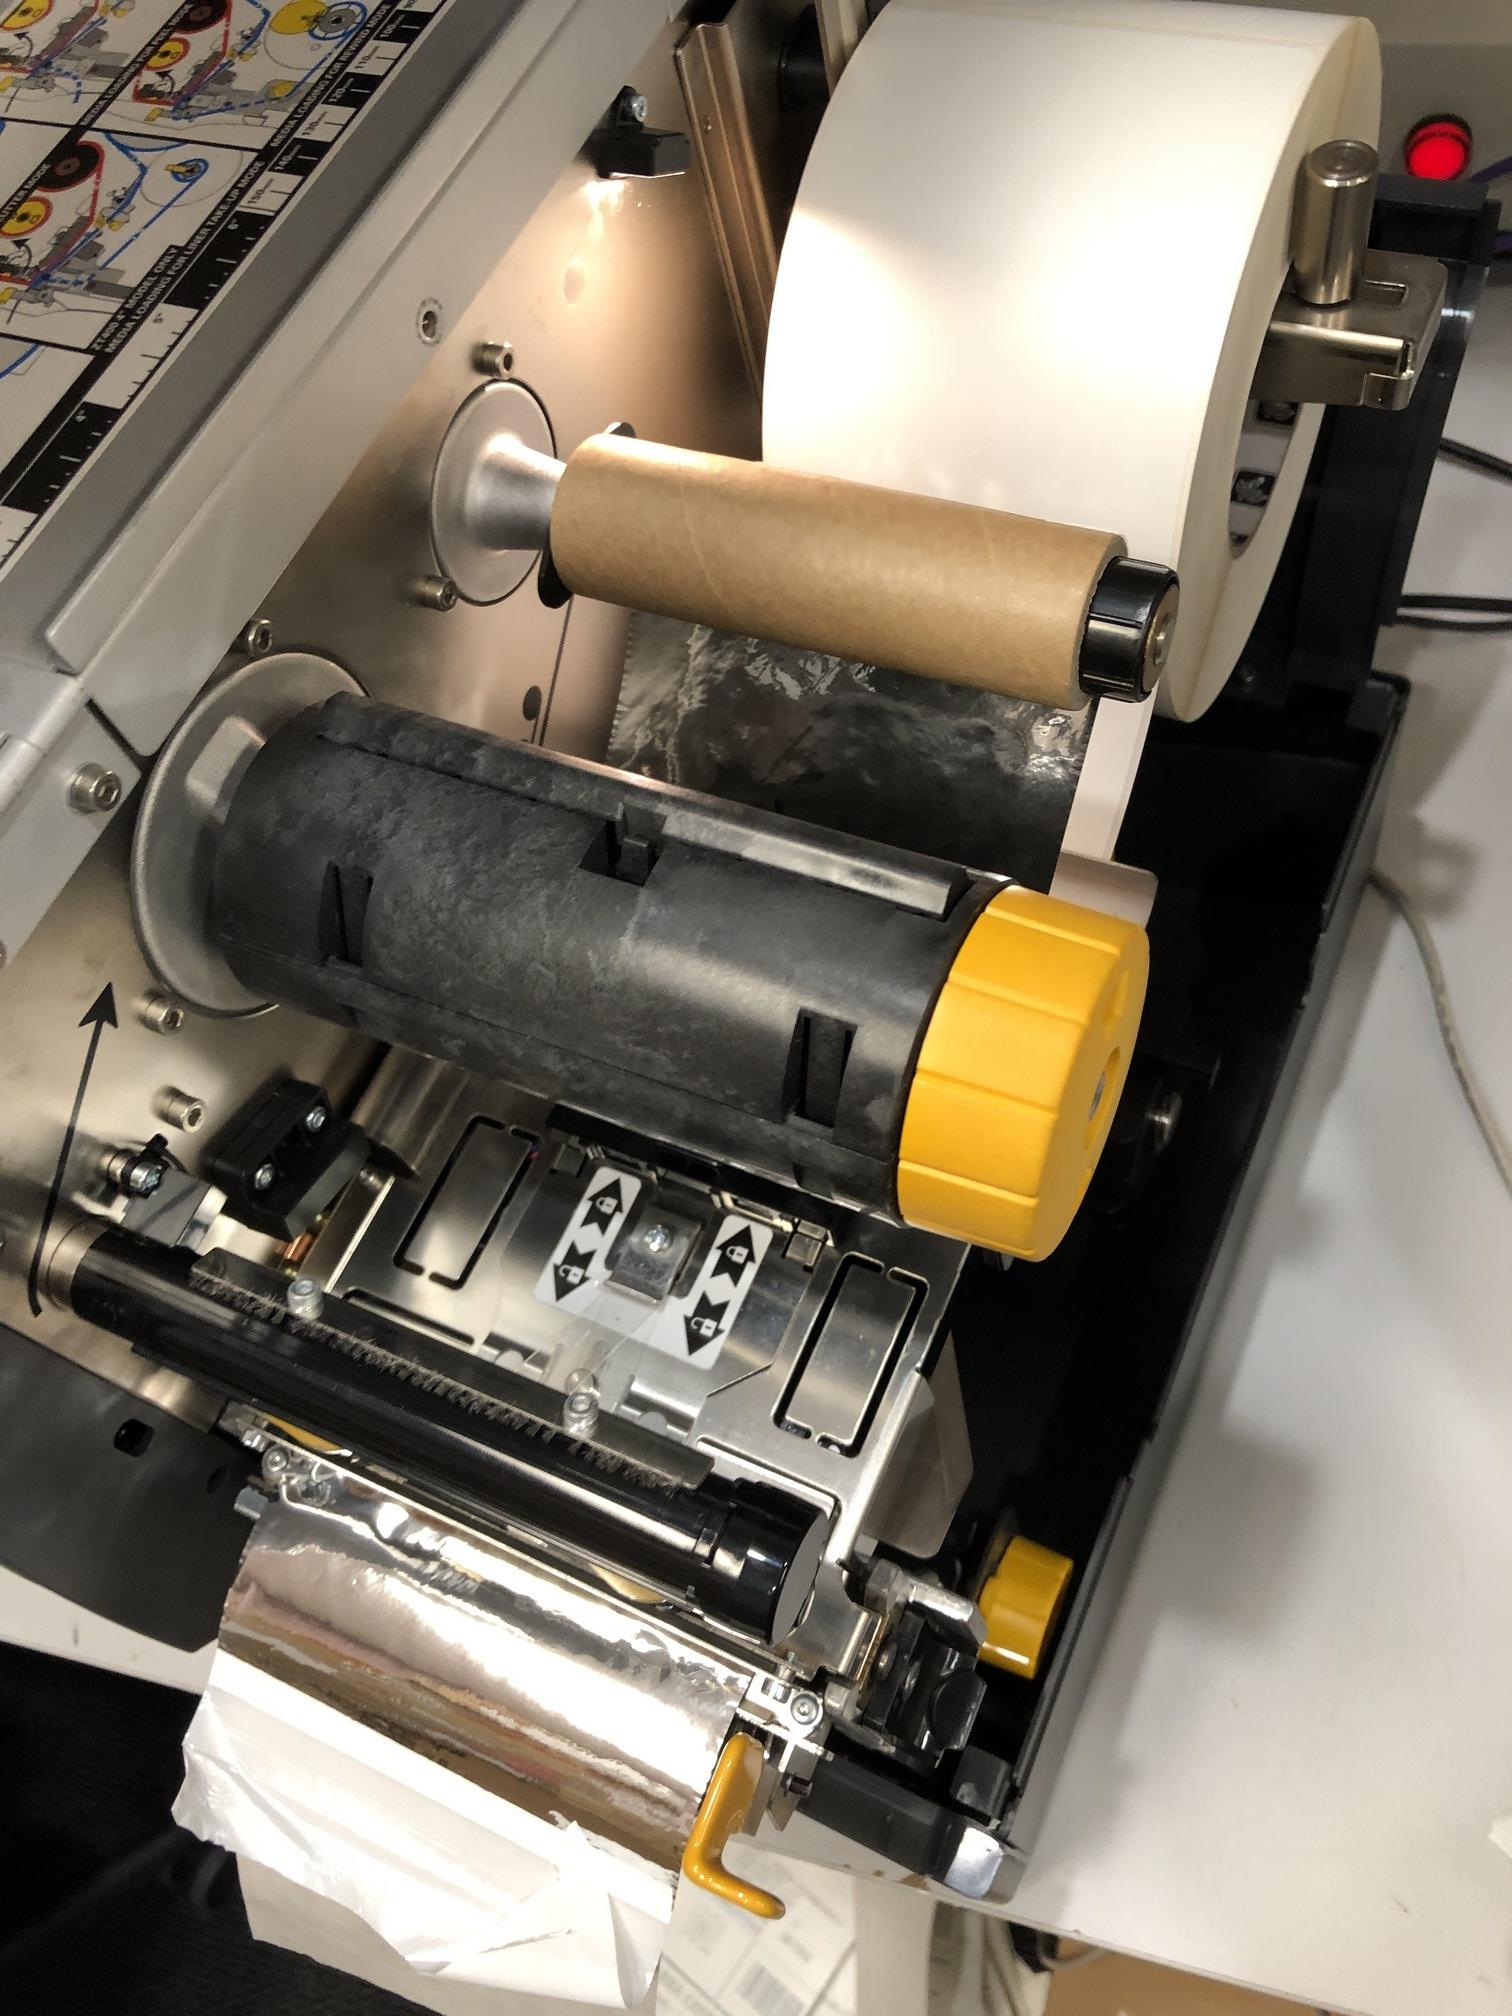 ZT400 Series Printers using White Ribbon